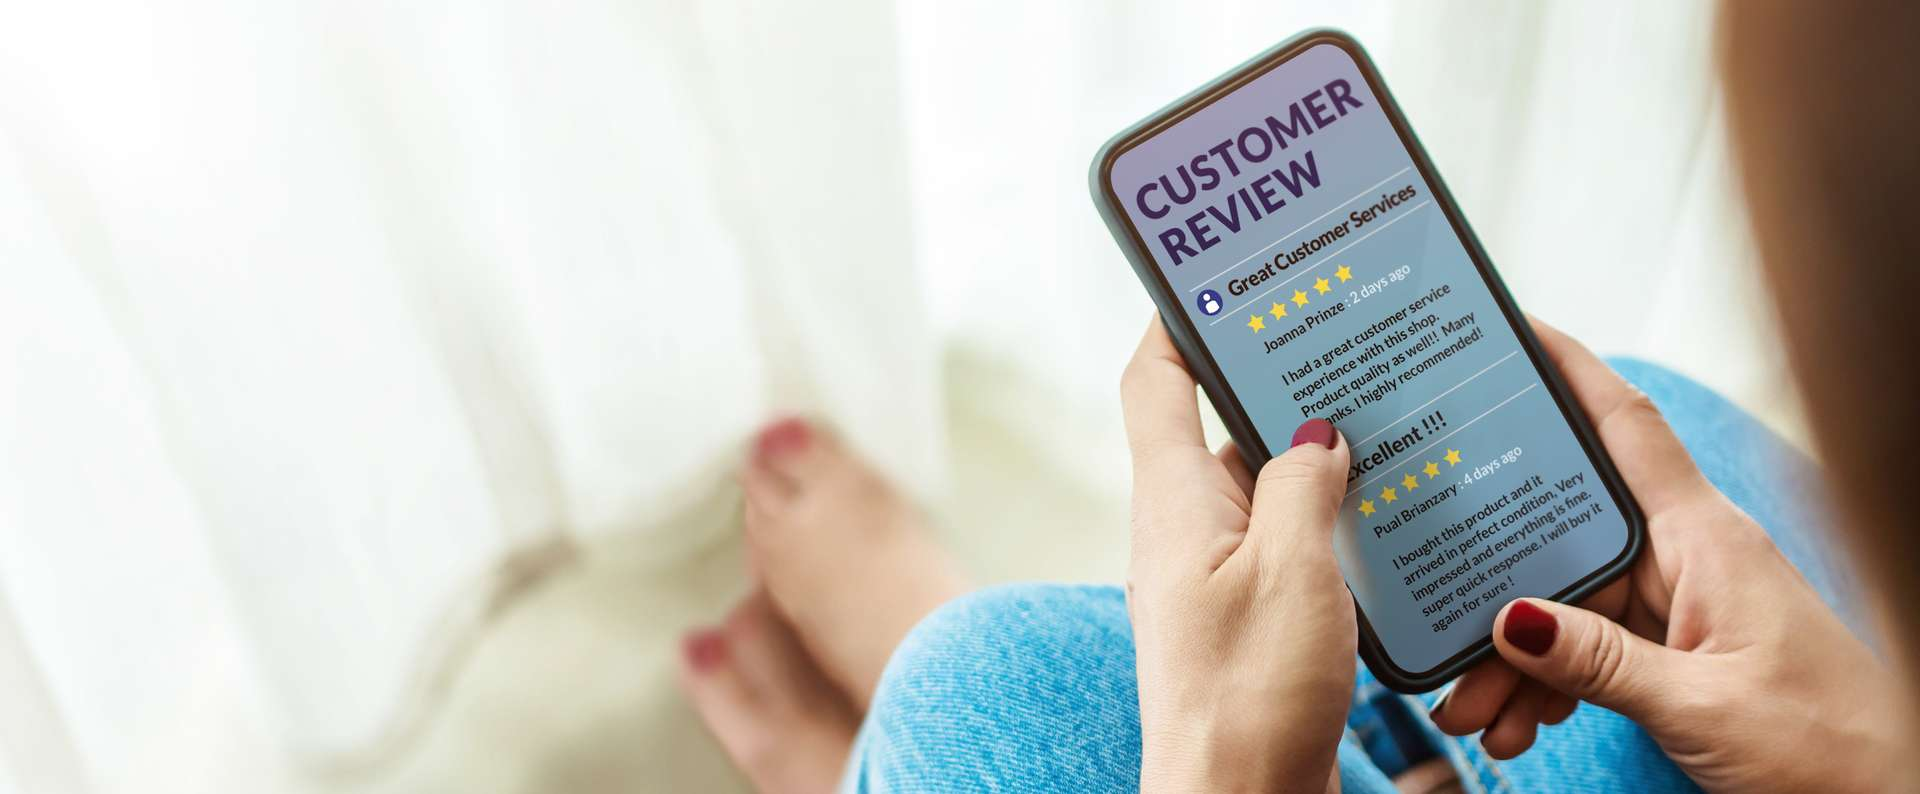 Cara Tingkatkan Review Positif Salon dari Pelanggan, Xperience Team